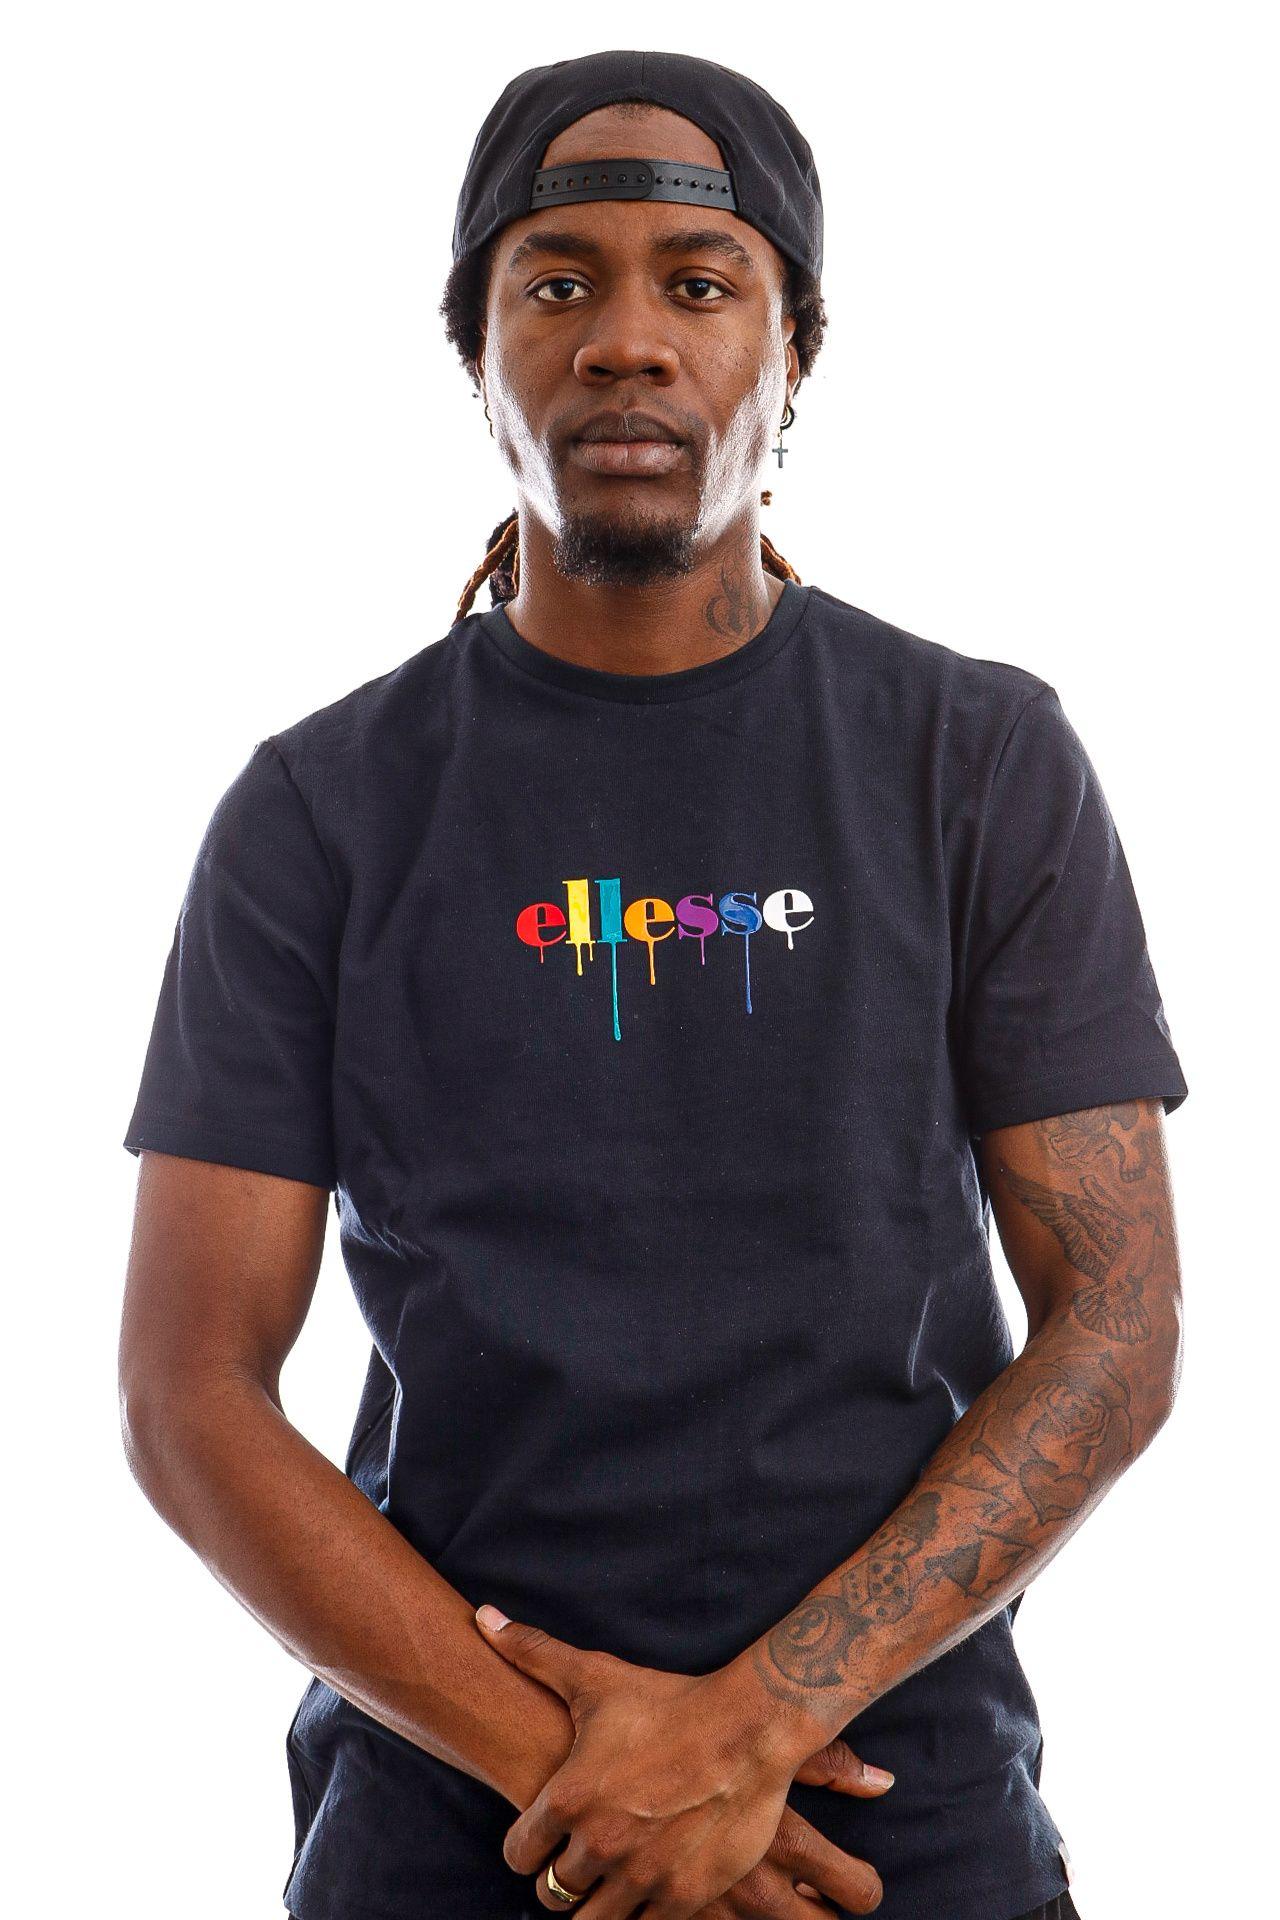 Afbeelding van Ellesse T-shirt Giorvoa Tee Black SHI11169